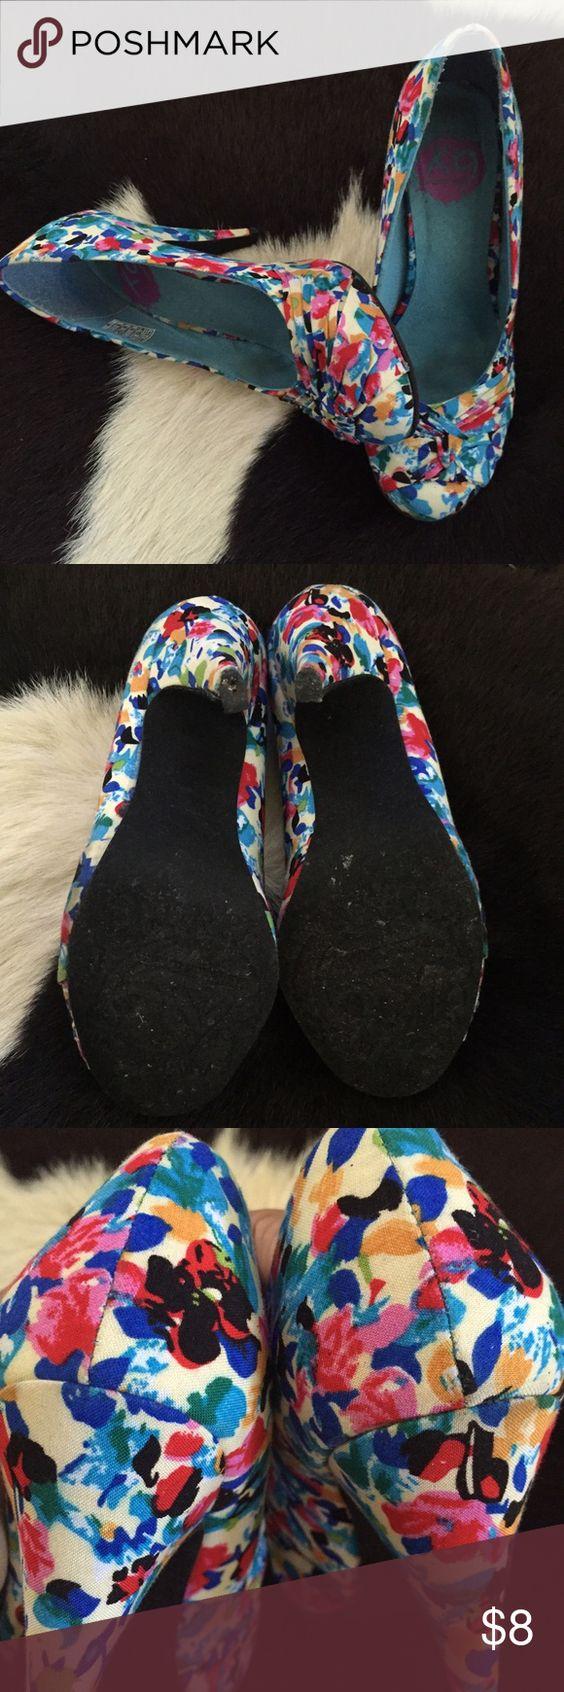 SHOE SALE ❗️ Rocket Dog colorful heels. Left shoe needs the tap heel. Price firm unless bundle. Rocket Dog Shoes Heels